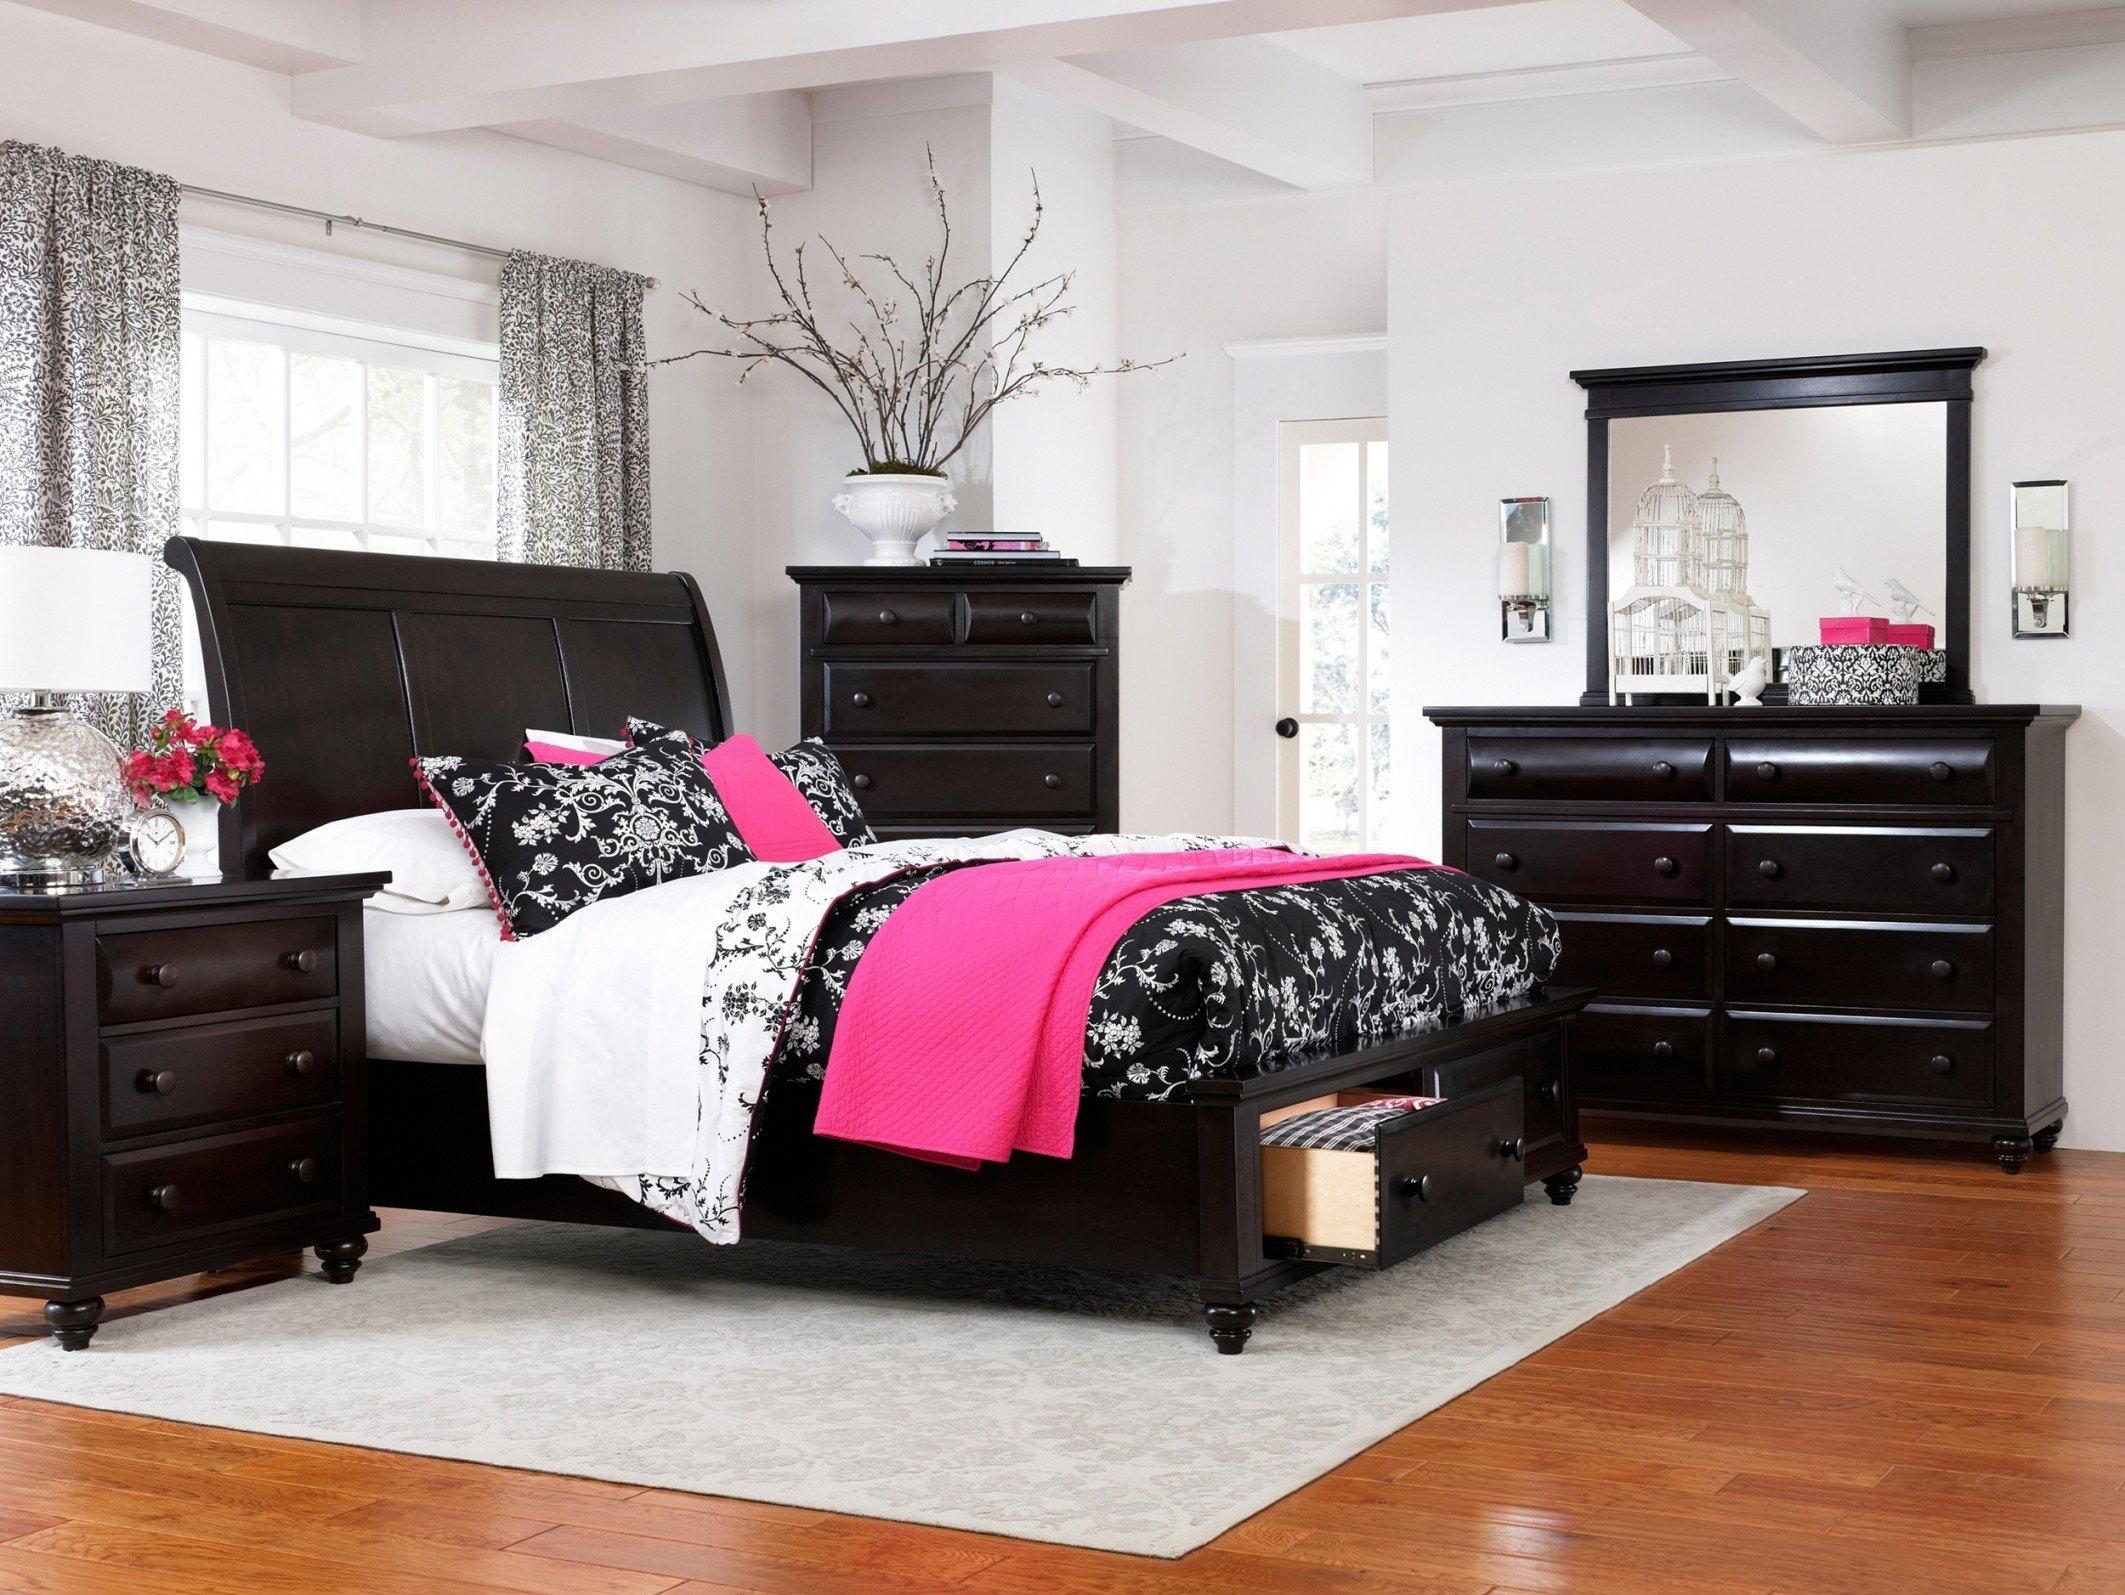 10 Lovable Pink And Black Bedroom Ideas pink and black bedroom furniture home decorating interior design 2020